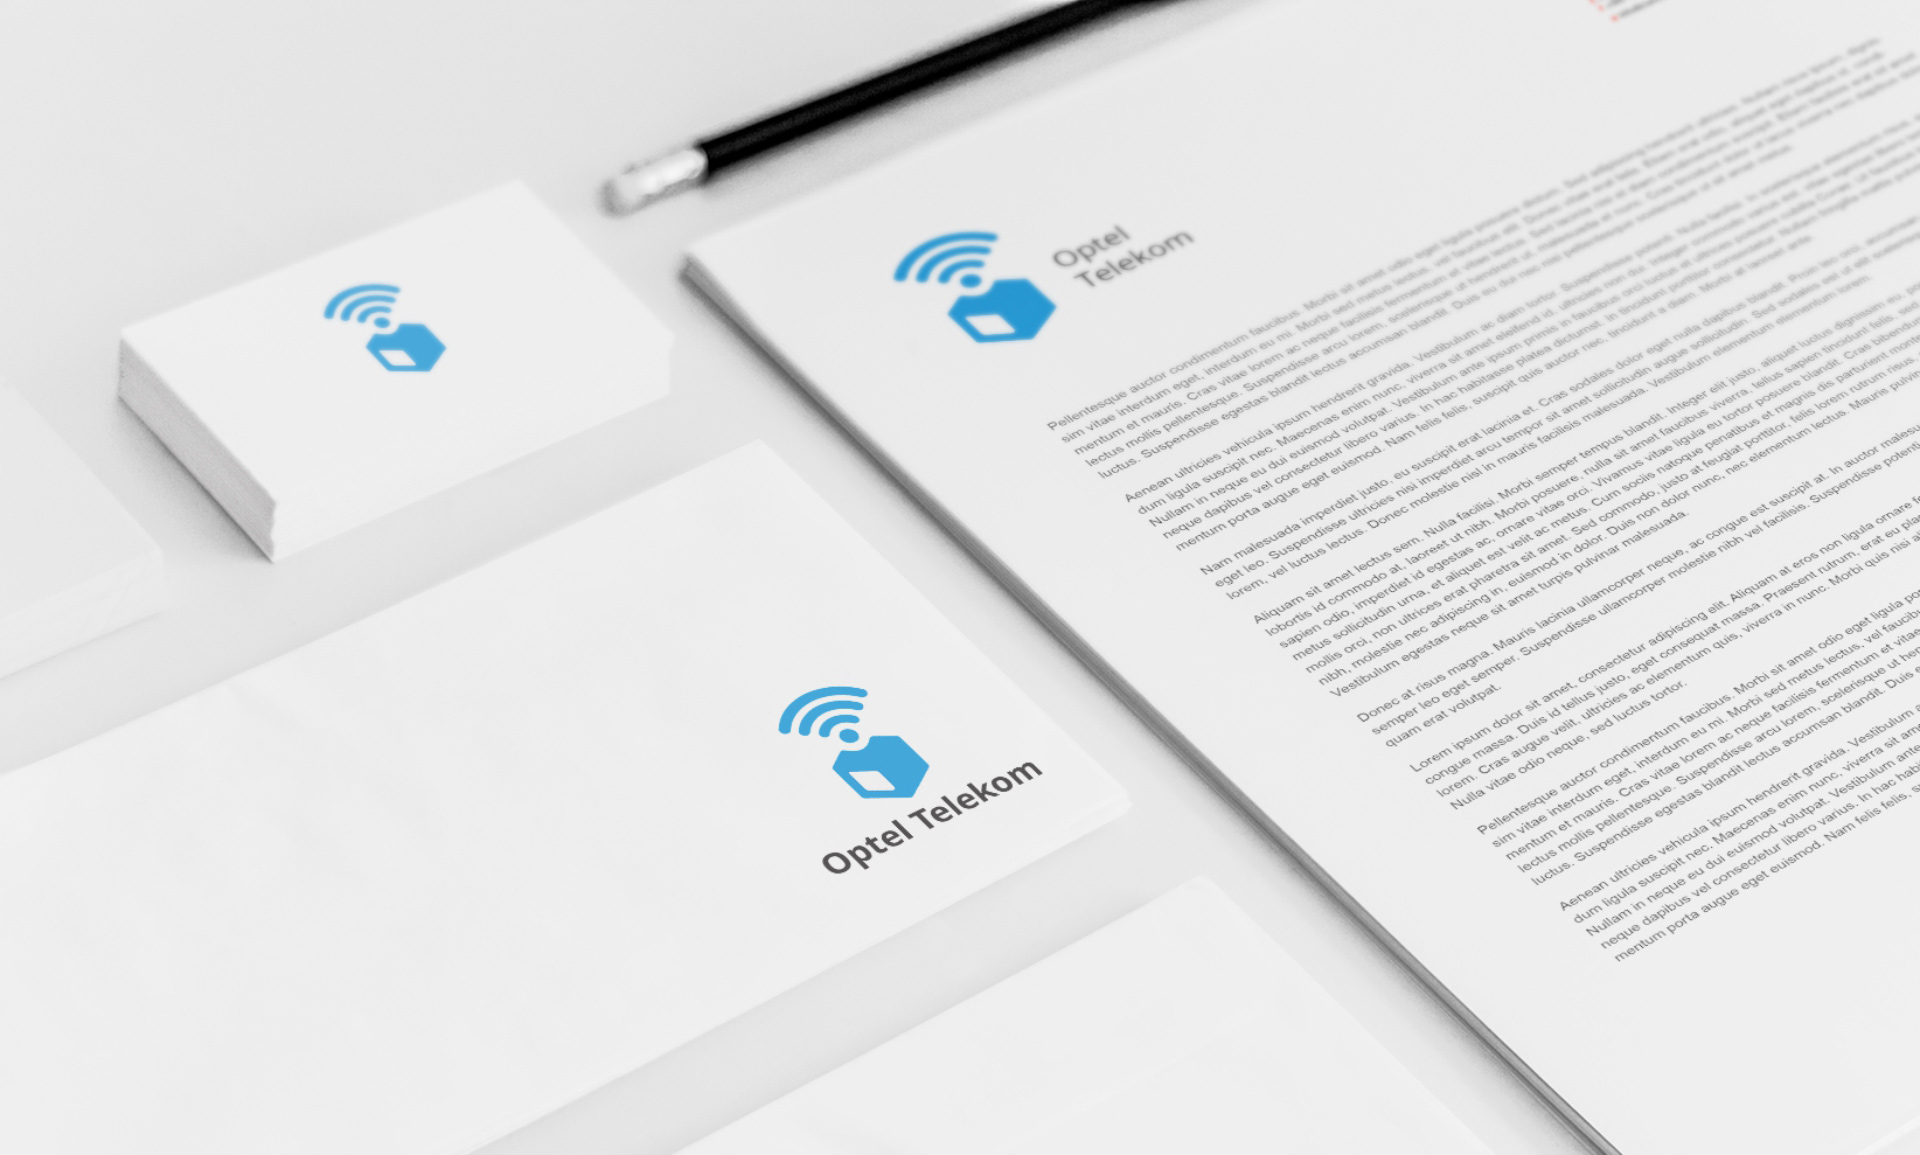 optel-telekom-stationery